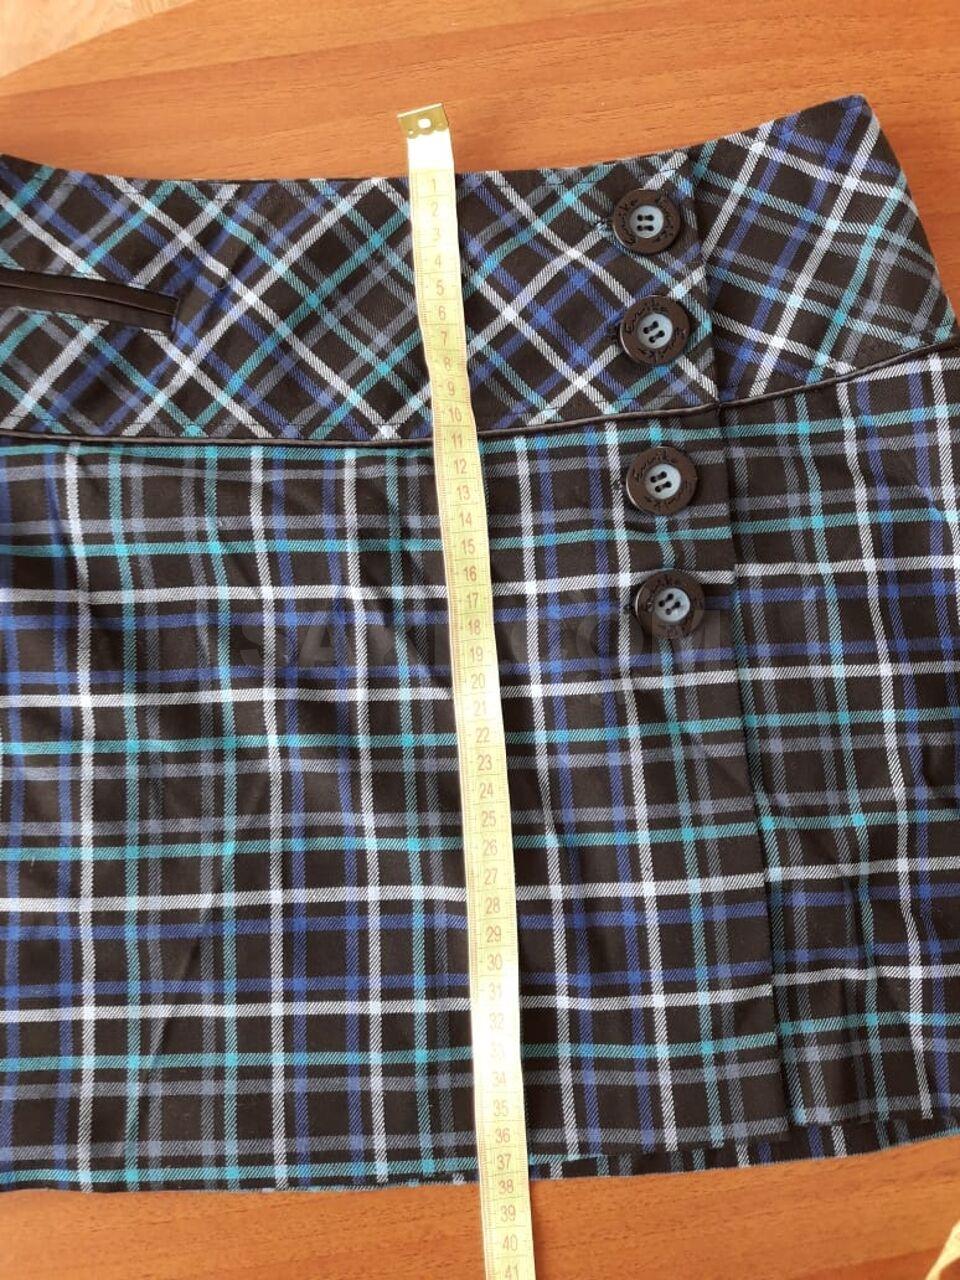 5cbf769598d Продам коротенькую юбку с запахом. Размер 46. Производство Россия фирма  Evrika.